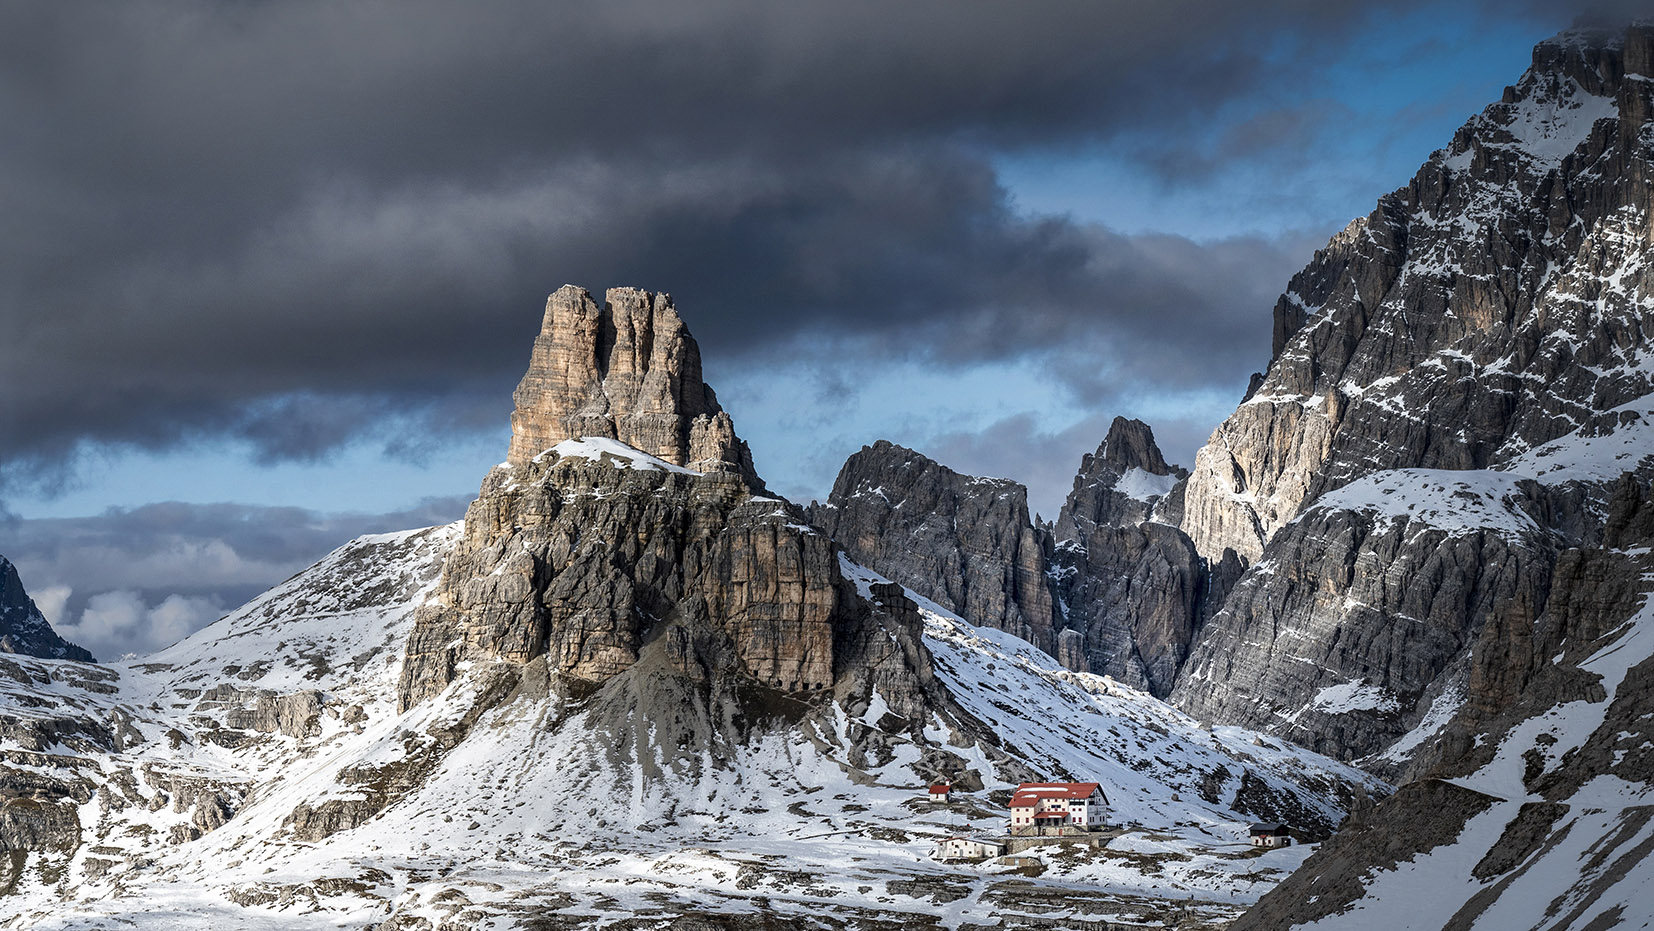 Tre cime di Lavaredo une semaine dans les Dolomites refuge Locatelli montagnes neige randonnée italie